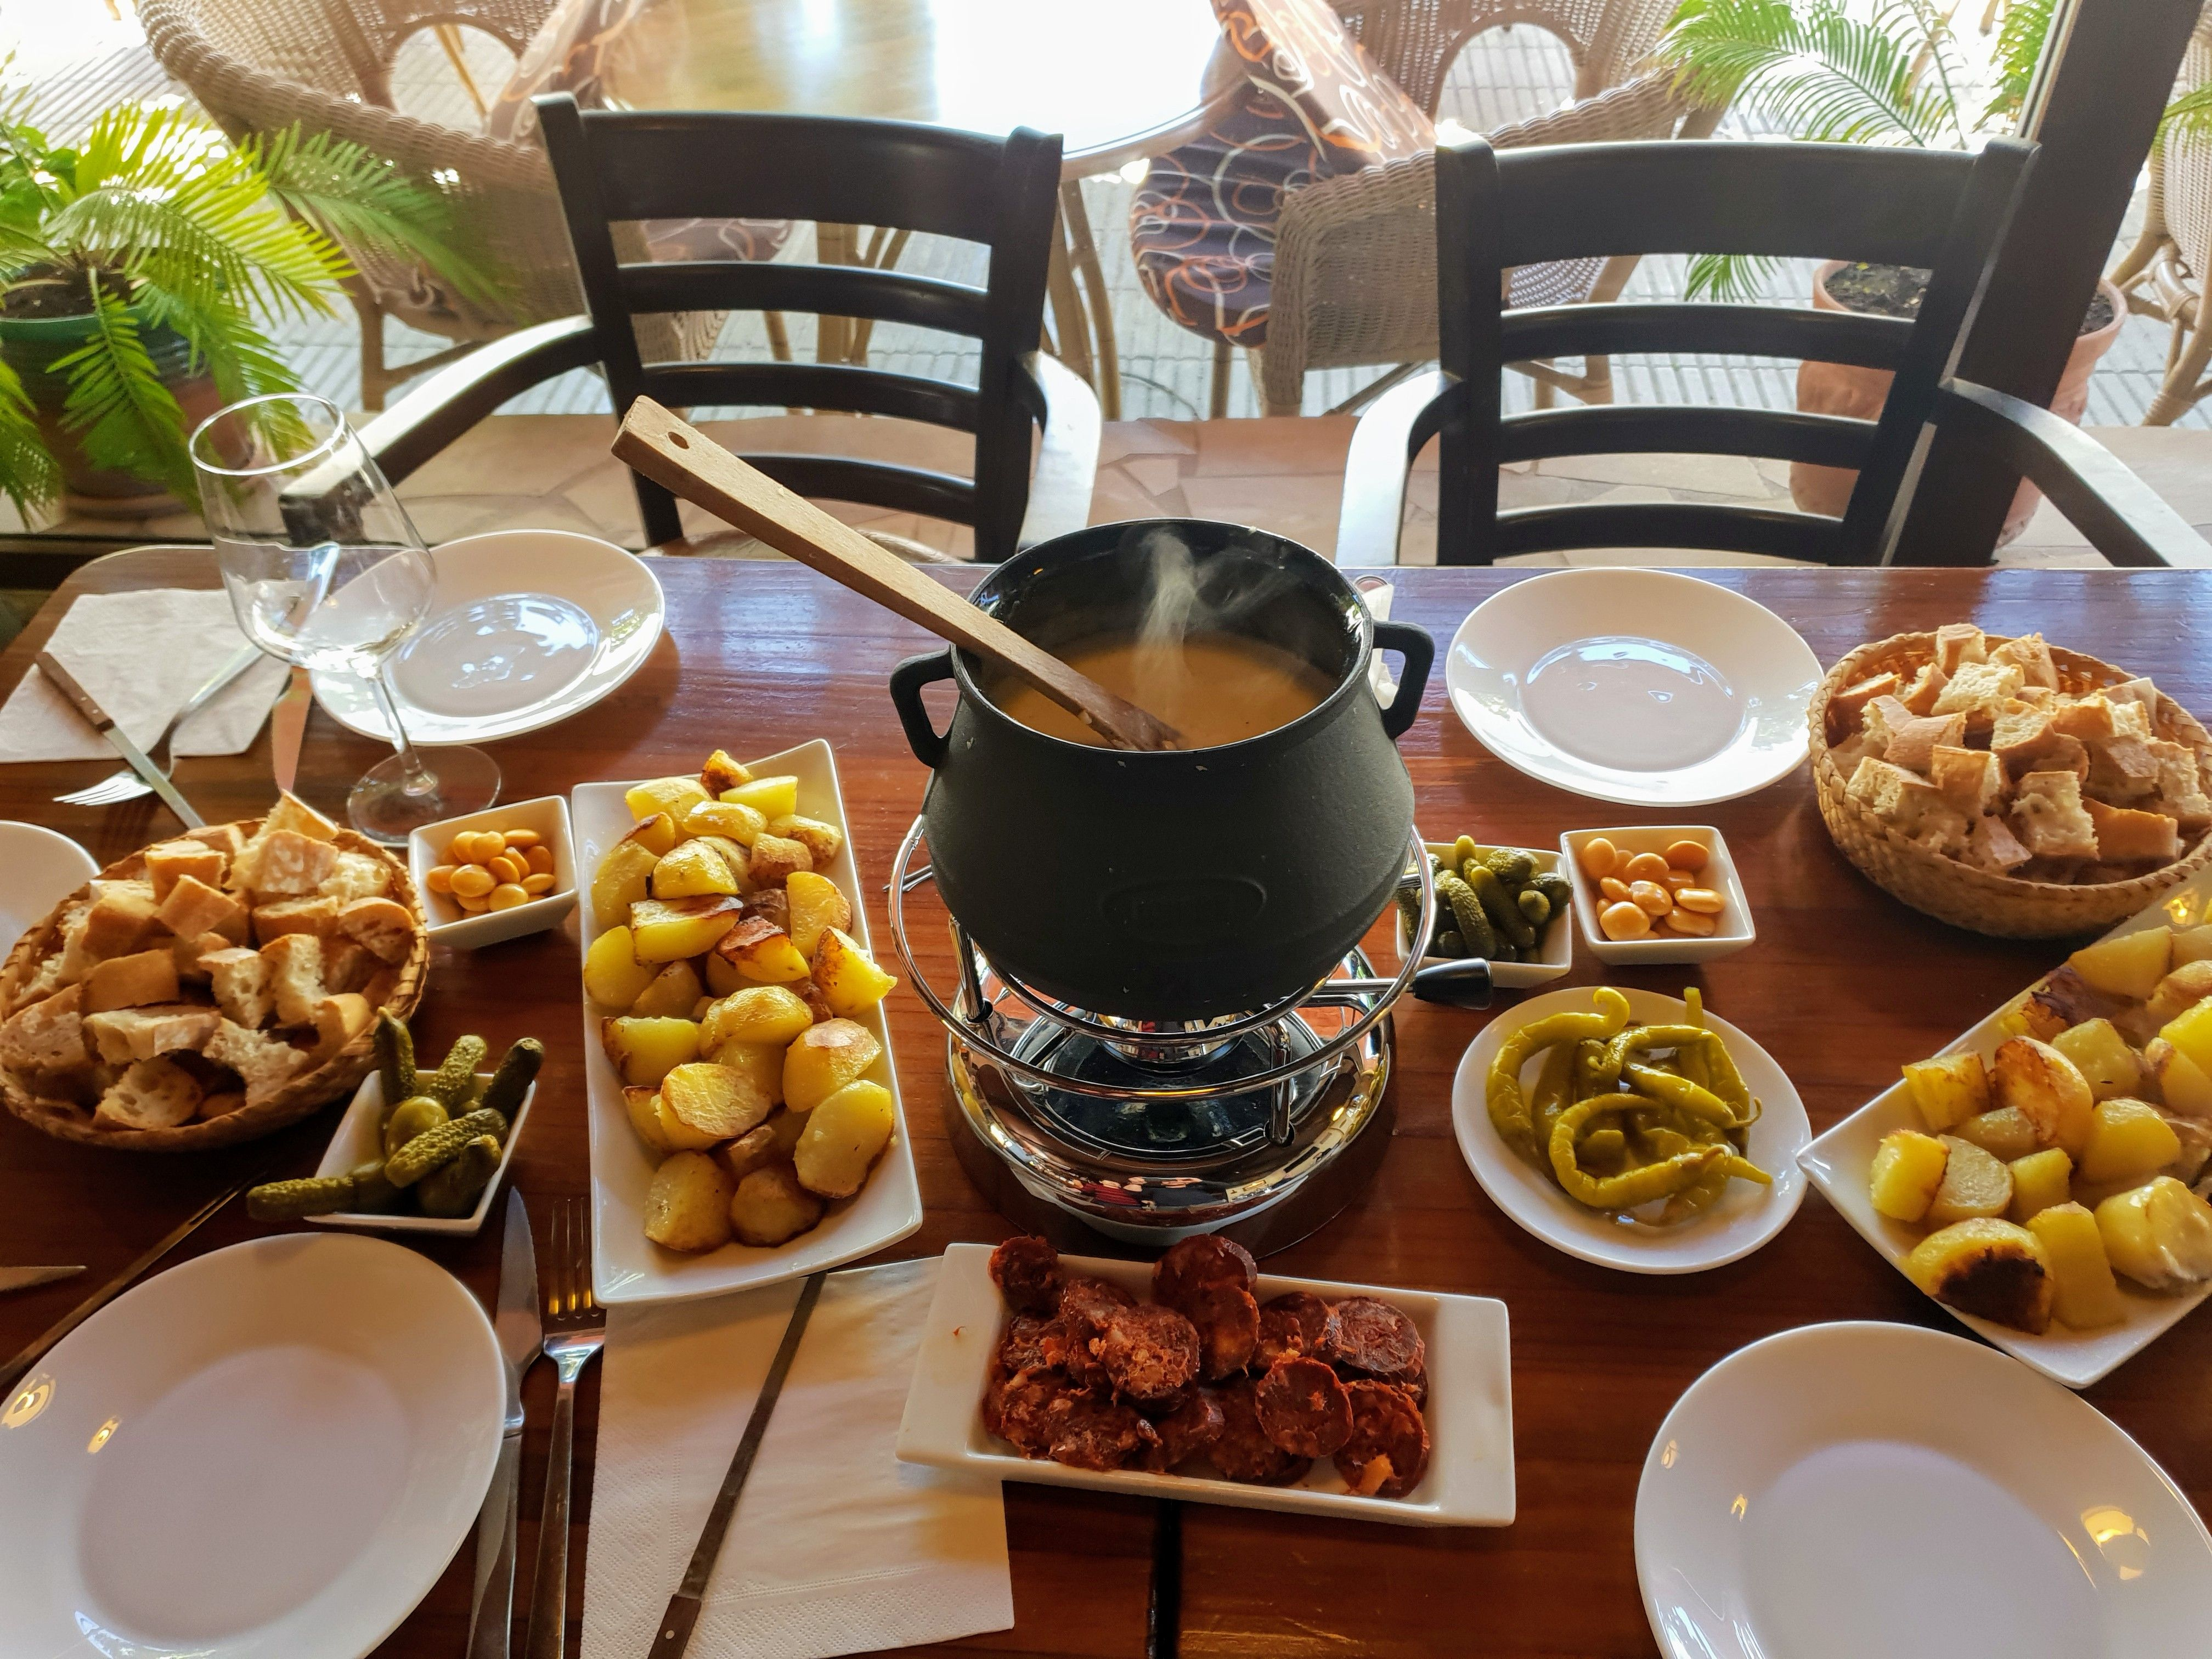 Cocina francesa, Fondue, Raclettes